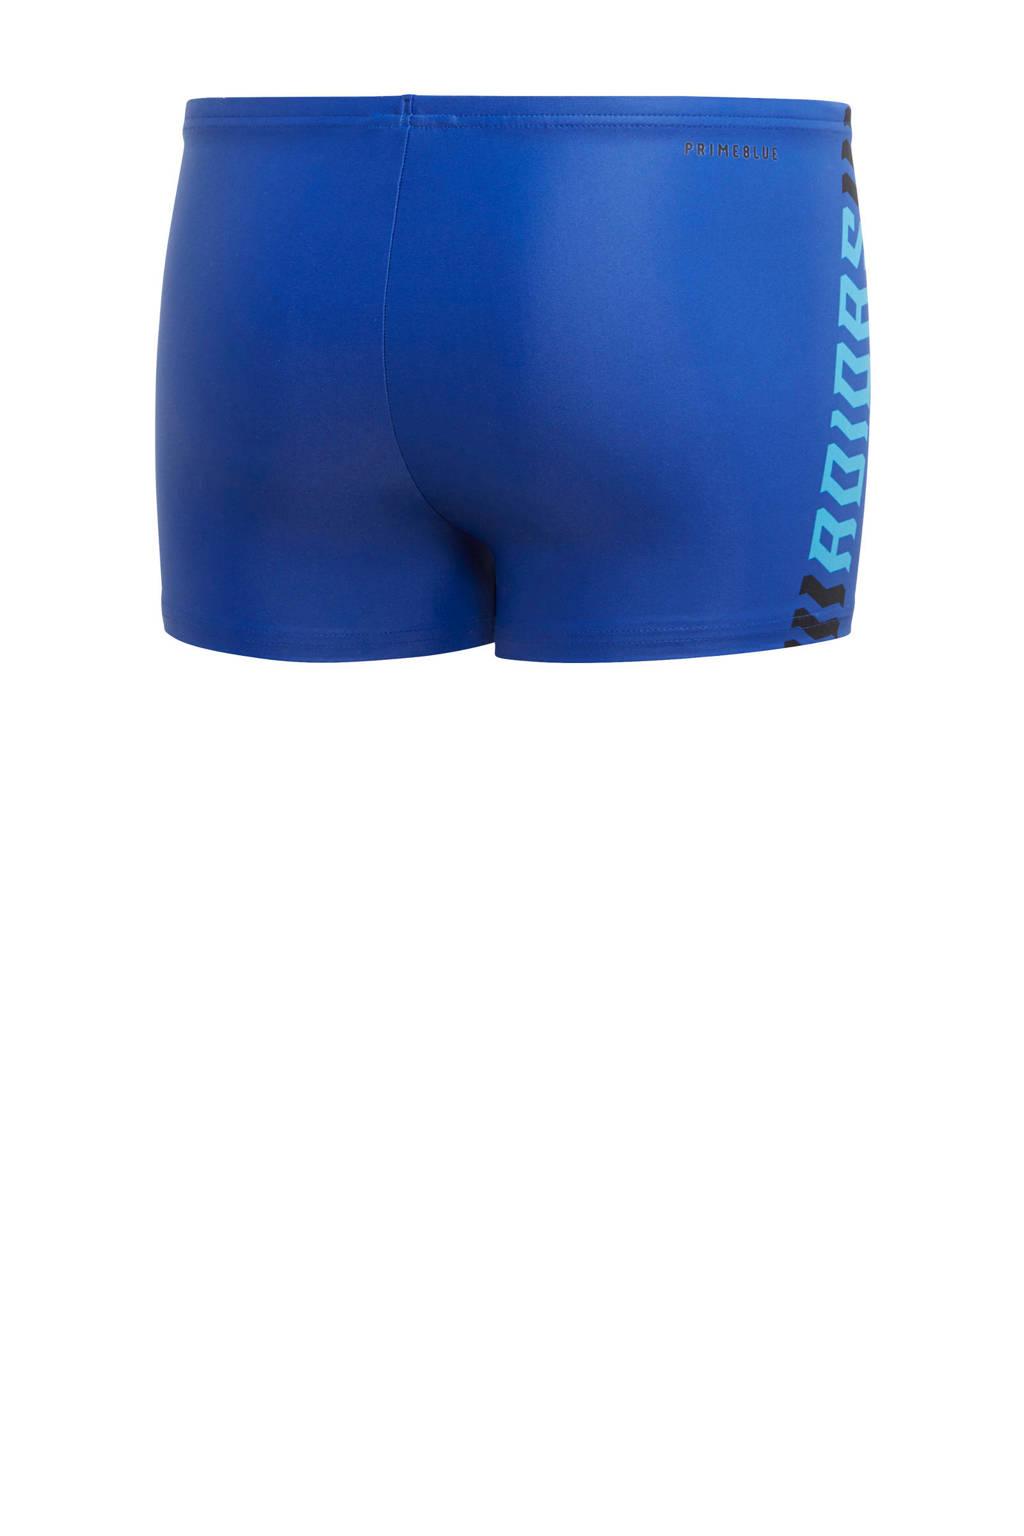 adidas Performance zwemboxer Fit blauw, Blauw